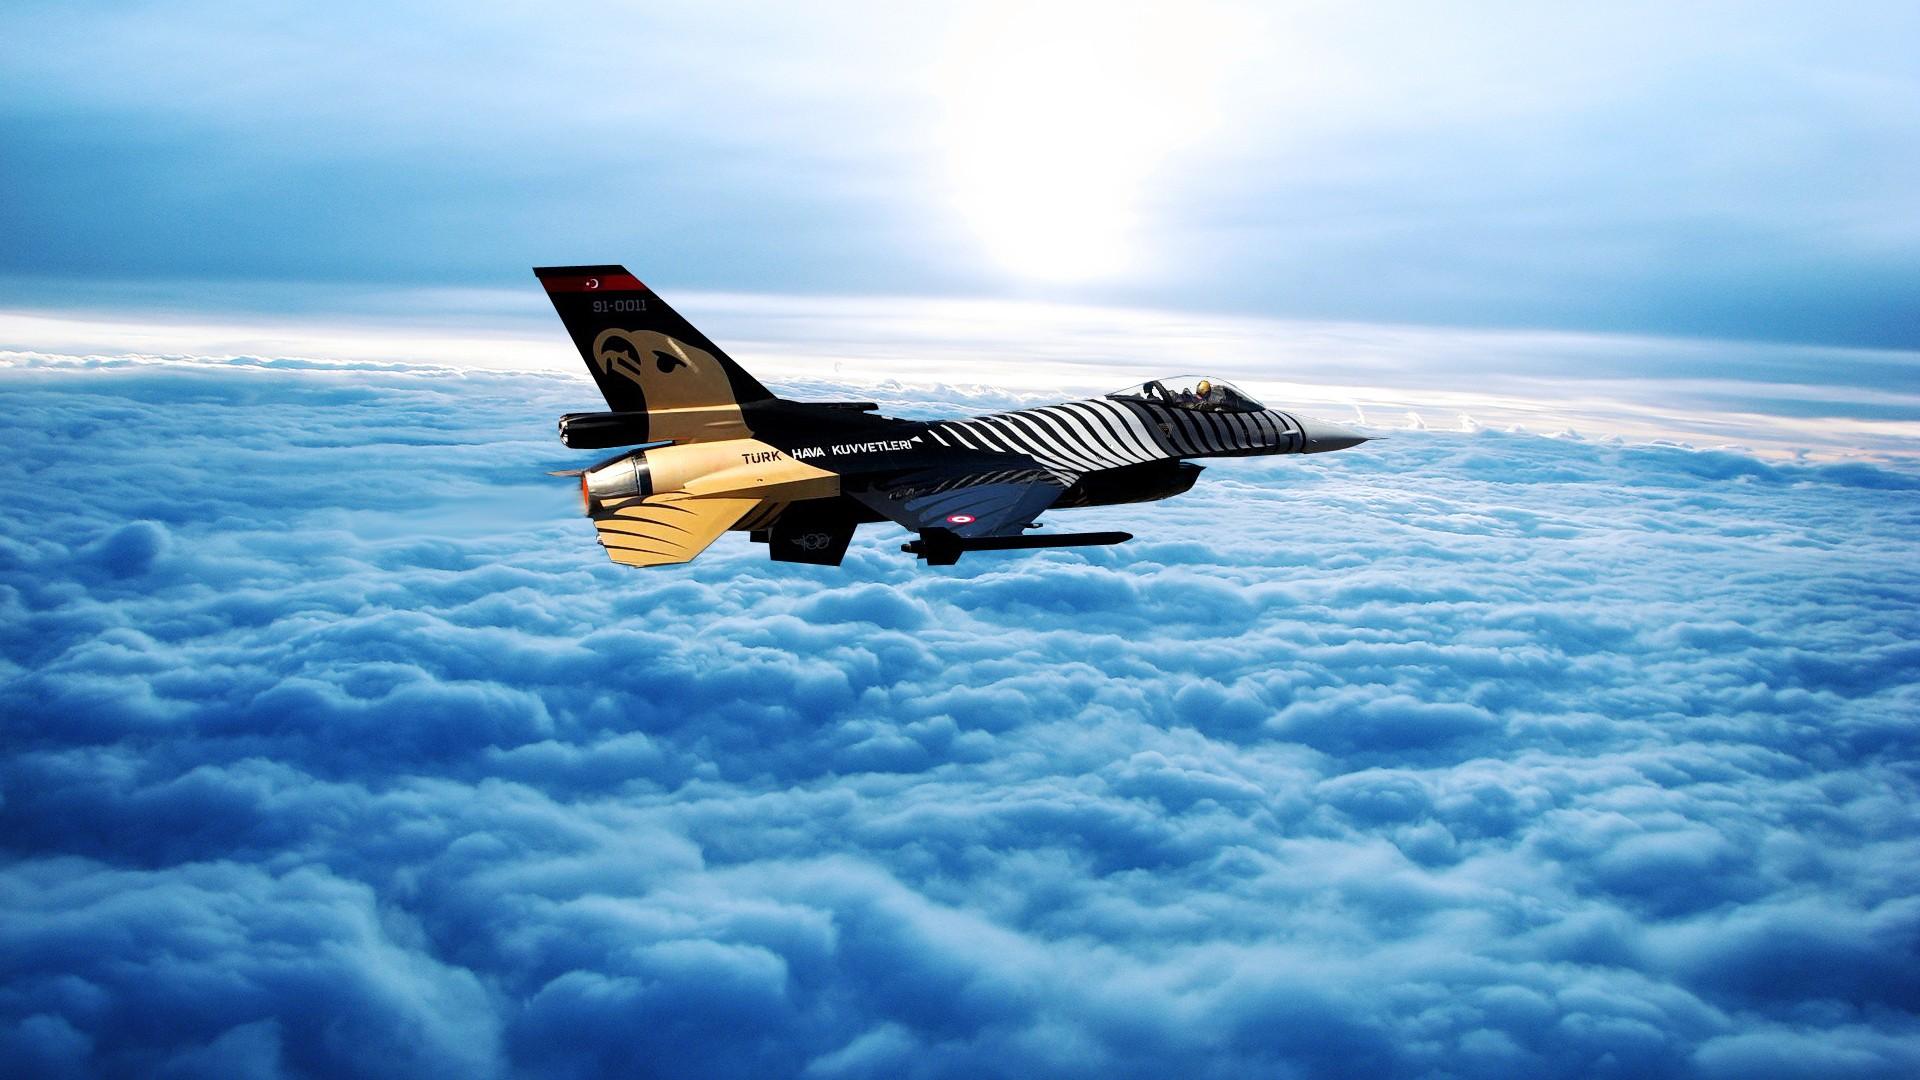 Wallpaper : sea, sky, vehicle, airplane, blue, General